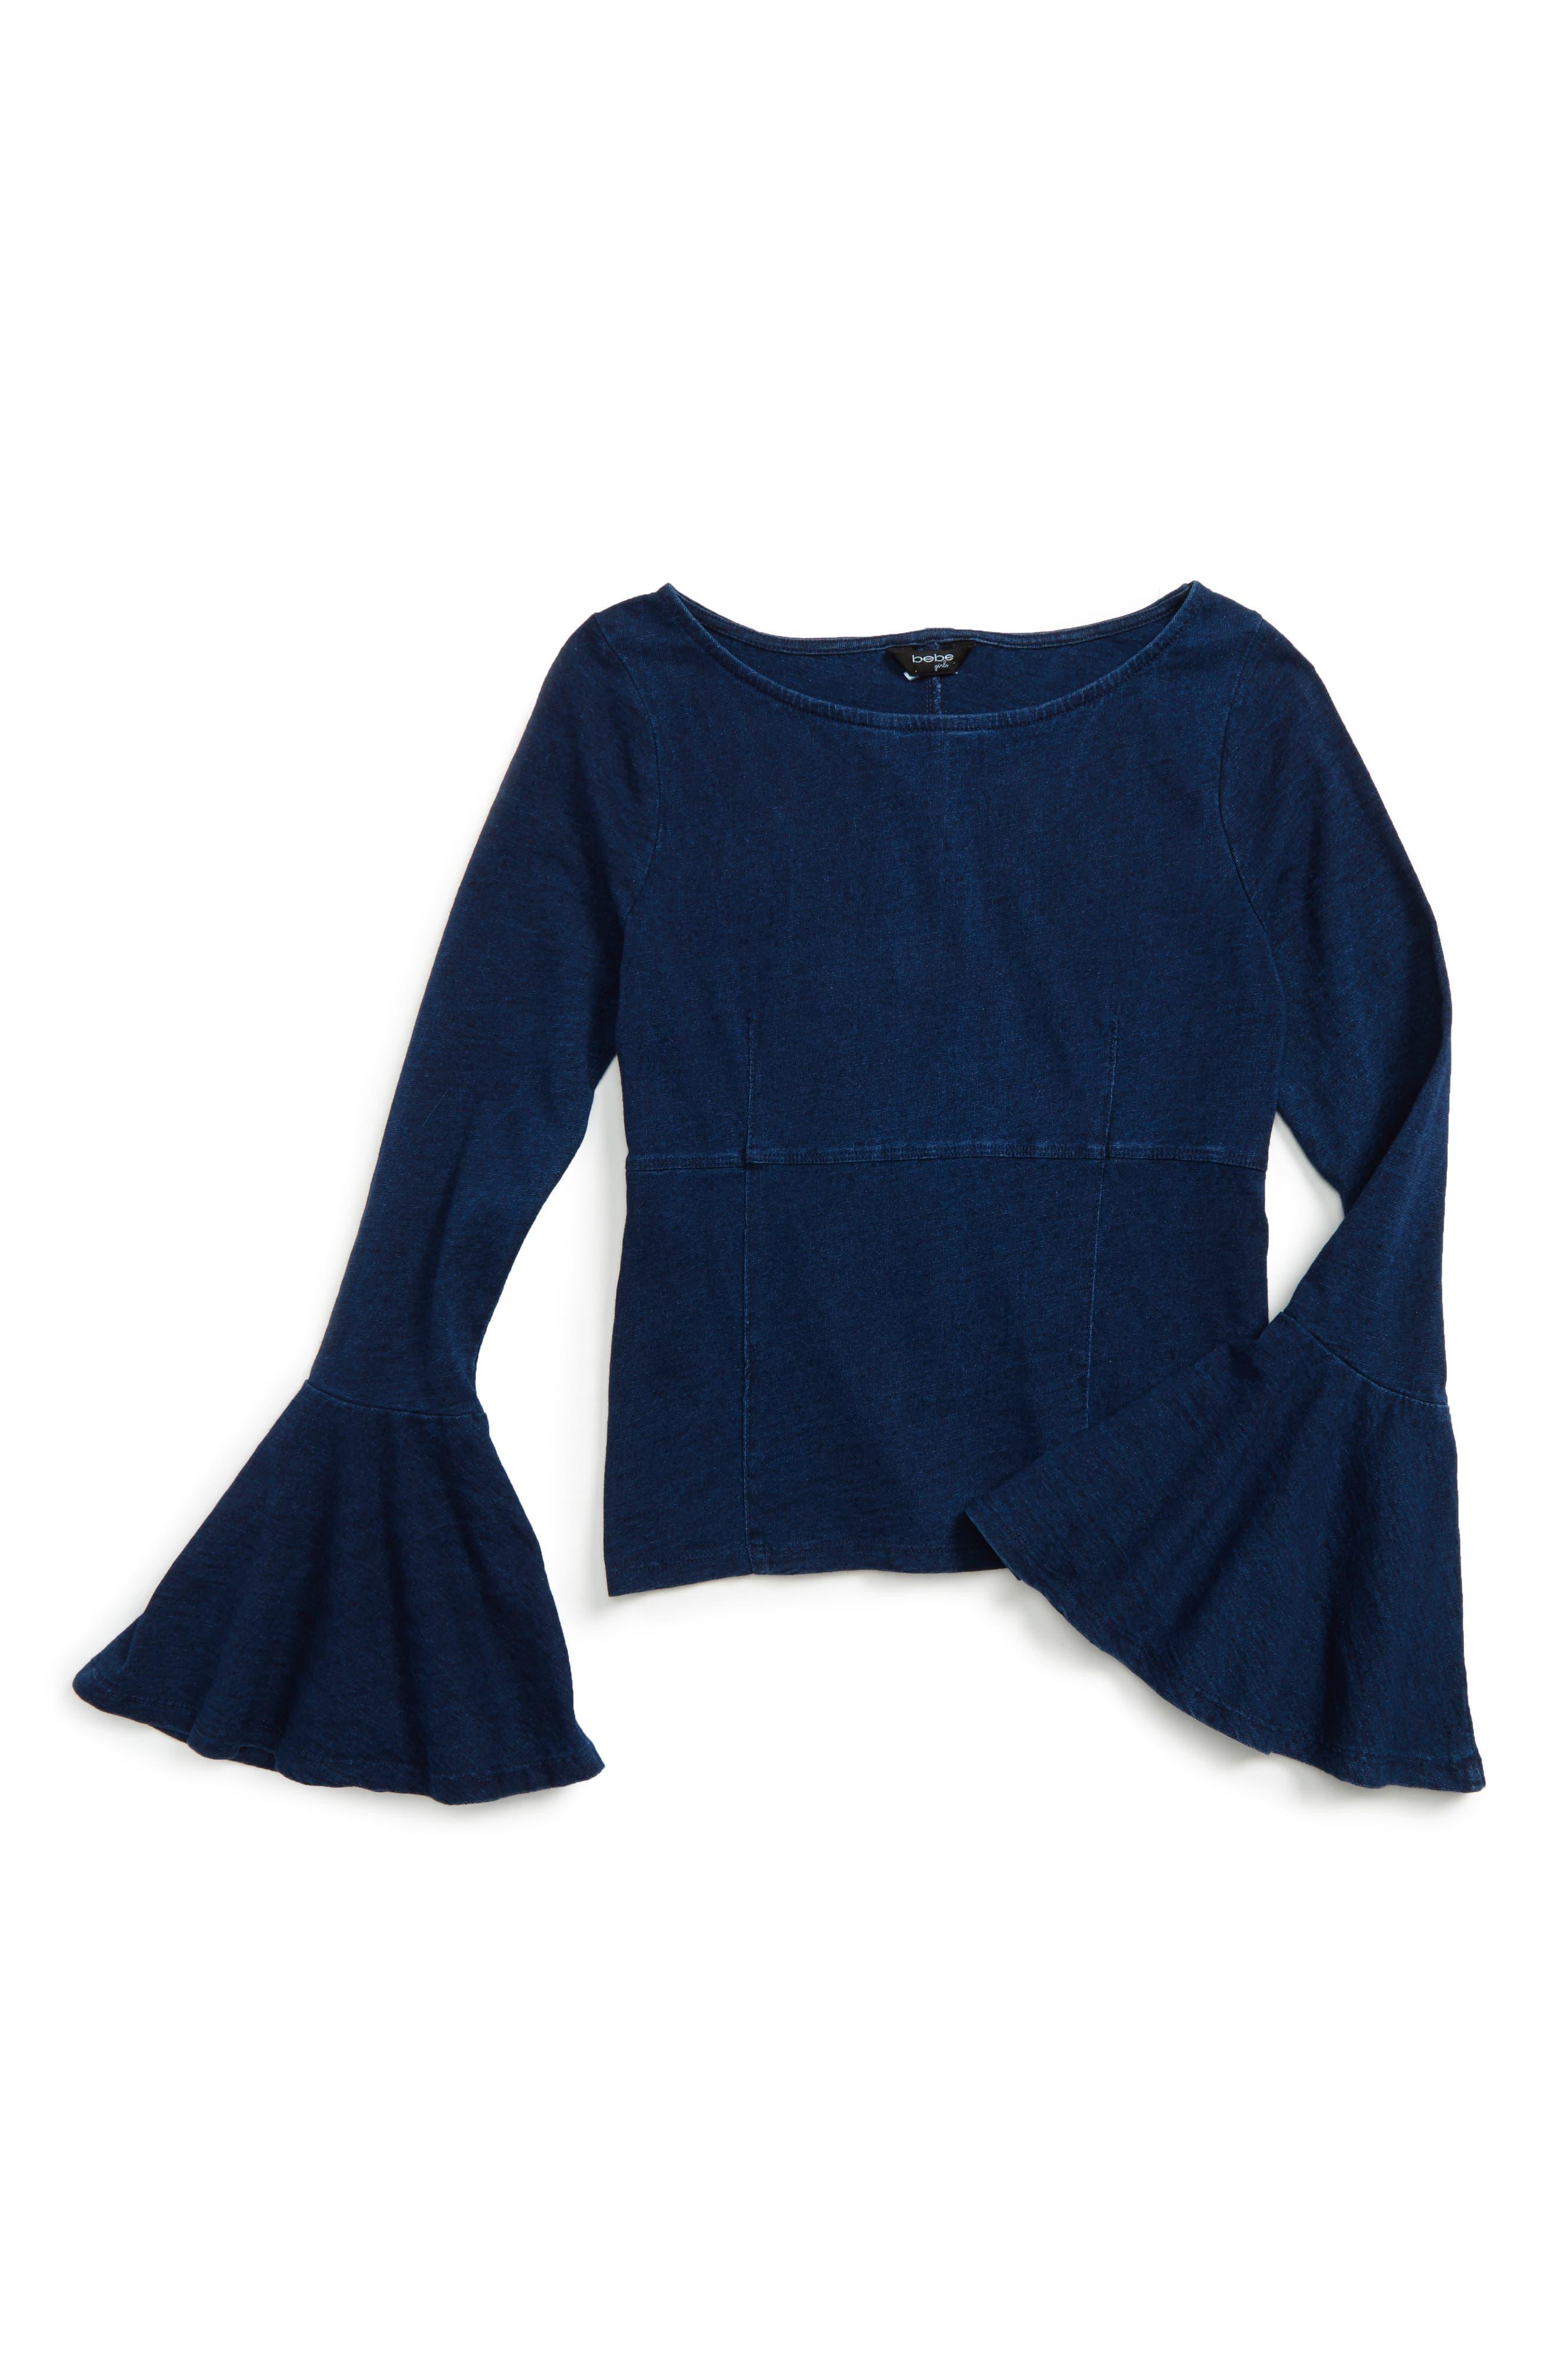 BEBE Bell Sleeve Knit Top